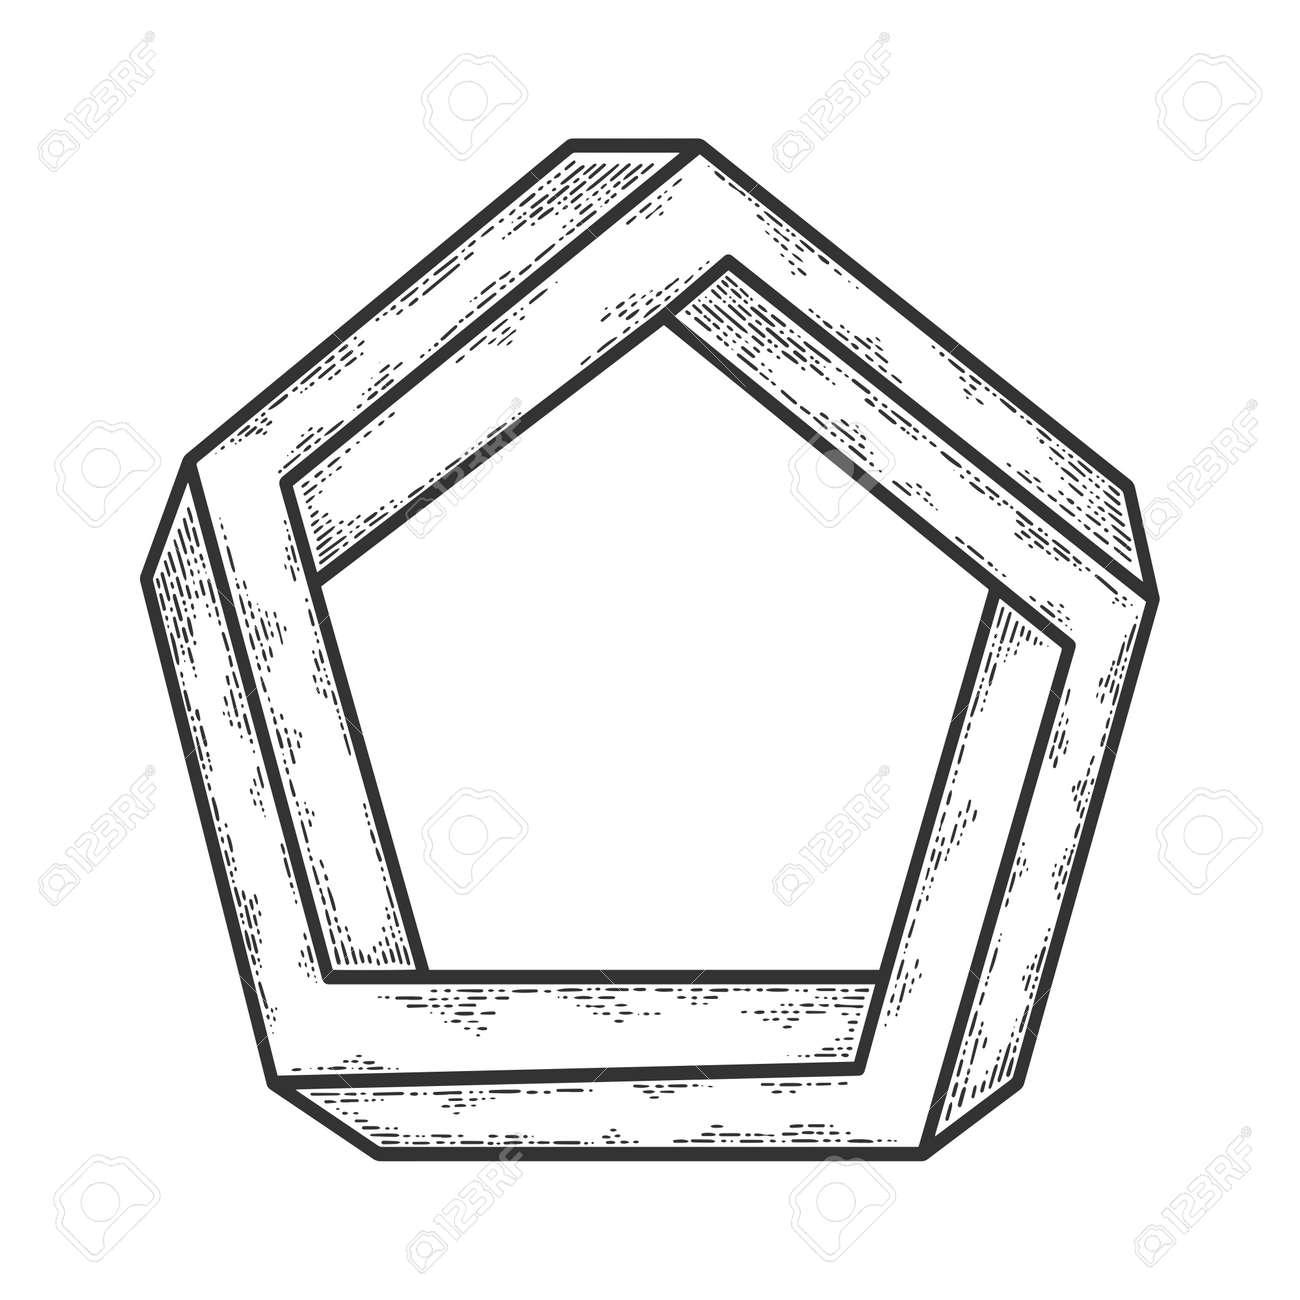 impossible pentagon sketch engraving illustration. T-shirt apparel print design. Scratch board imitation. Black and white hand drawn image. - 137493562